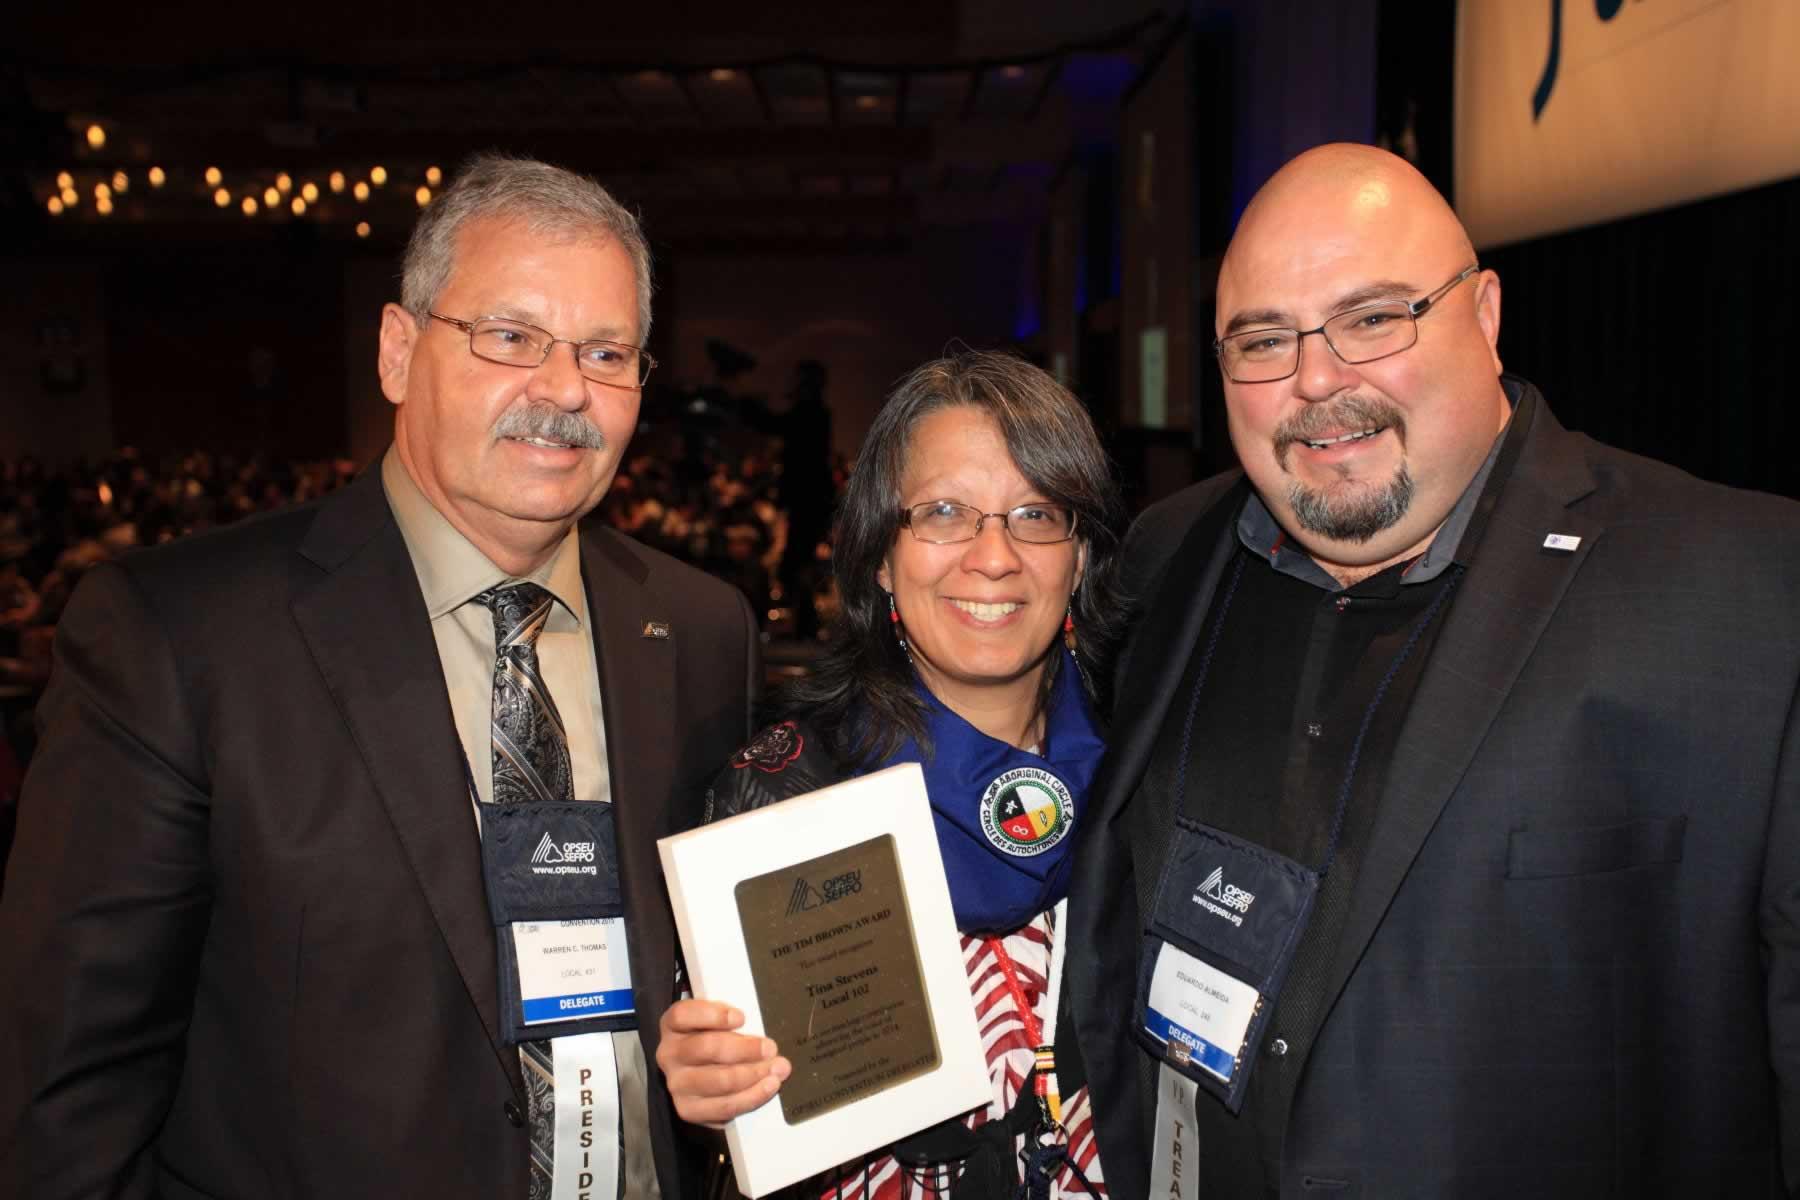 OPSEU President Warren (Smokey) Thomas and First Vice-President/Treasurer Eduardo (Eddy) Almeida with Tim Brown Award winner Tina Stevens during Convention 2015